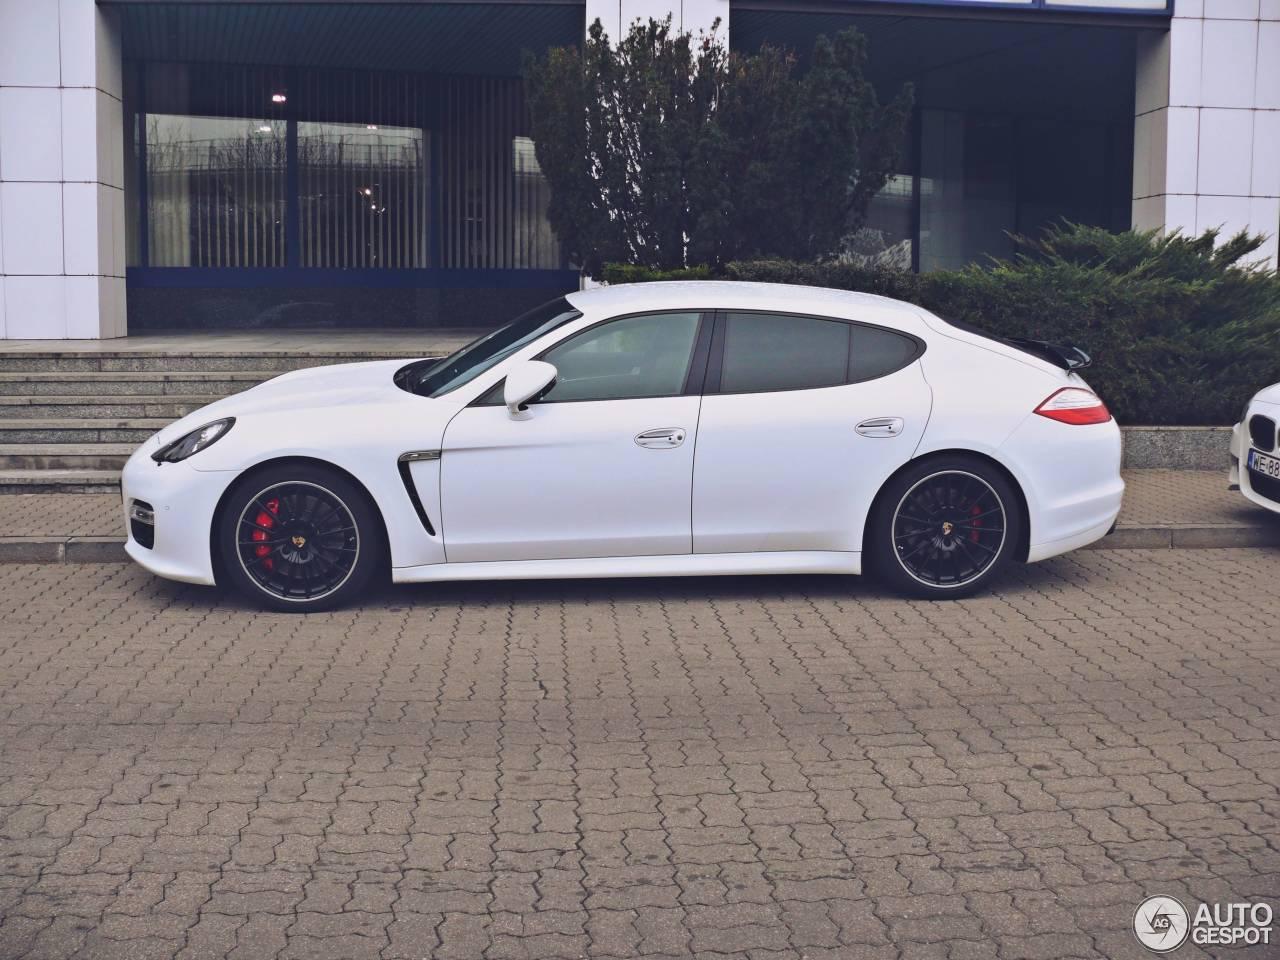 Porsche Panamera Gts 22 February 2015 Autogespot